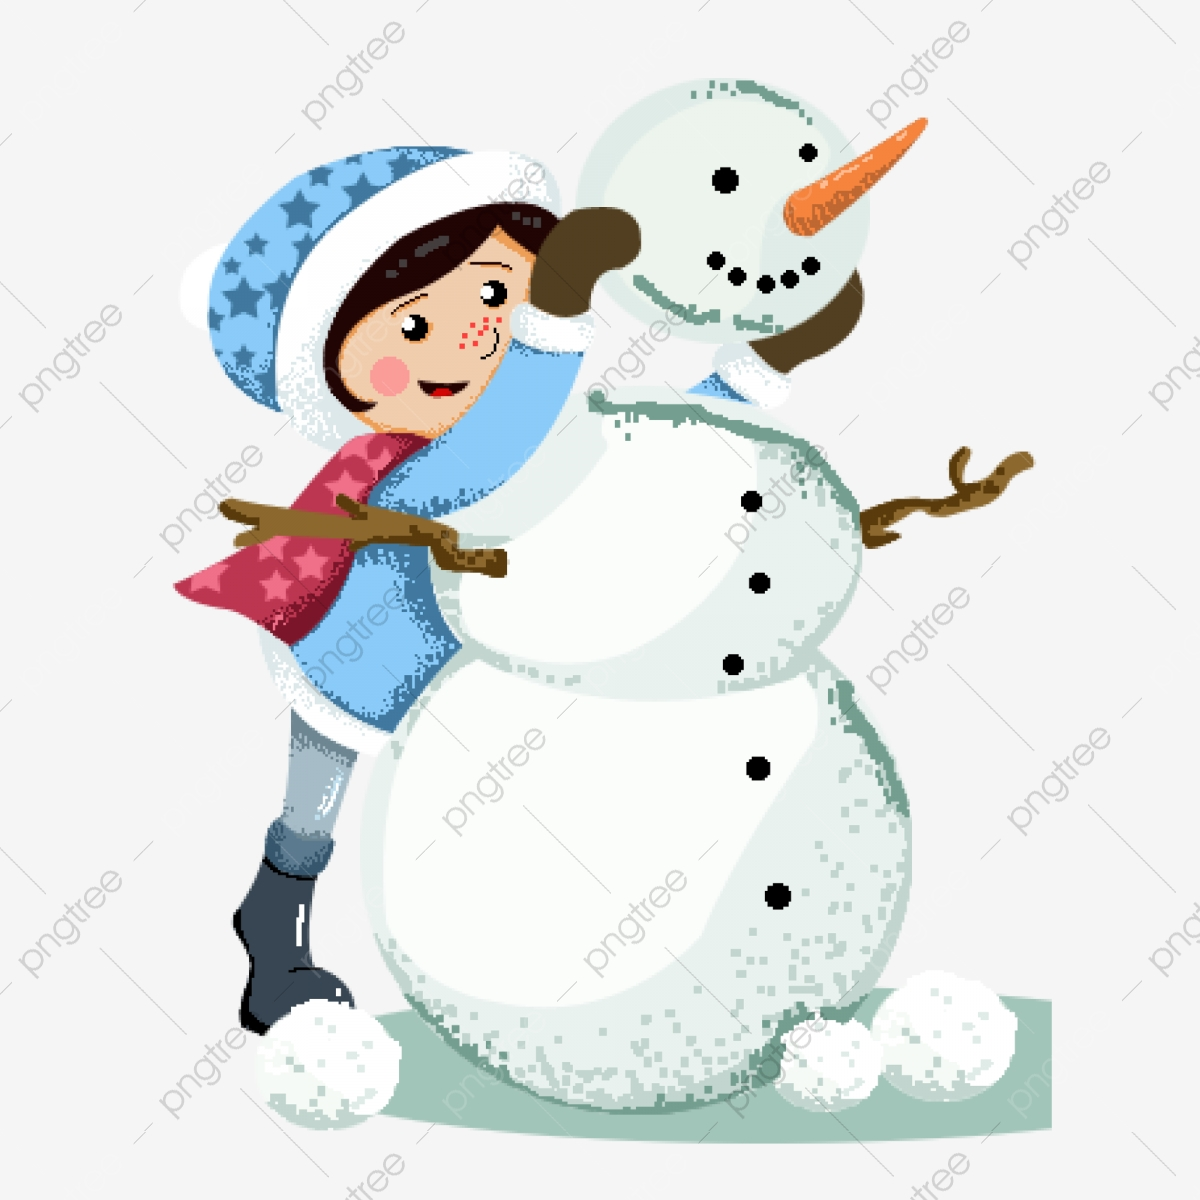 Elementos De Muñeco Nieve Niño Dibujados A Mano Muñeco De Nieve Dibujos Animados Niño Png Y Psd Para Descargar Gratis Pngtree